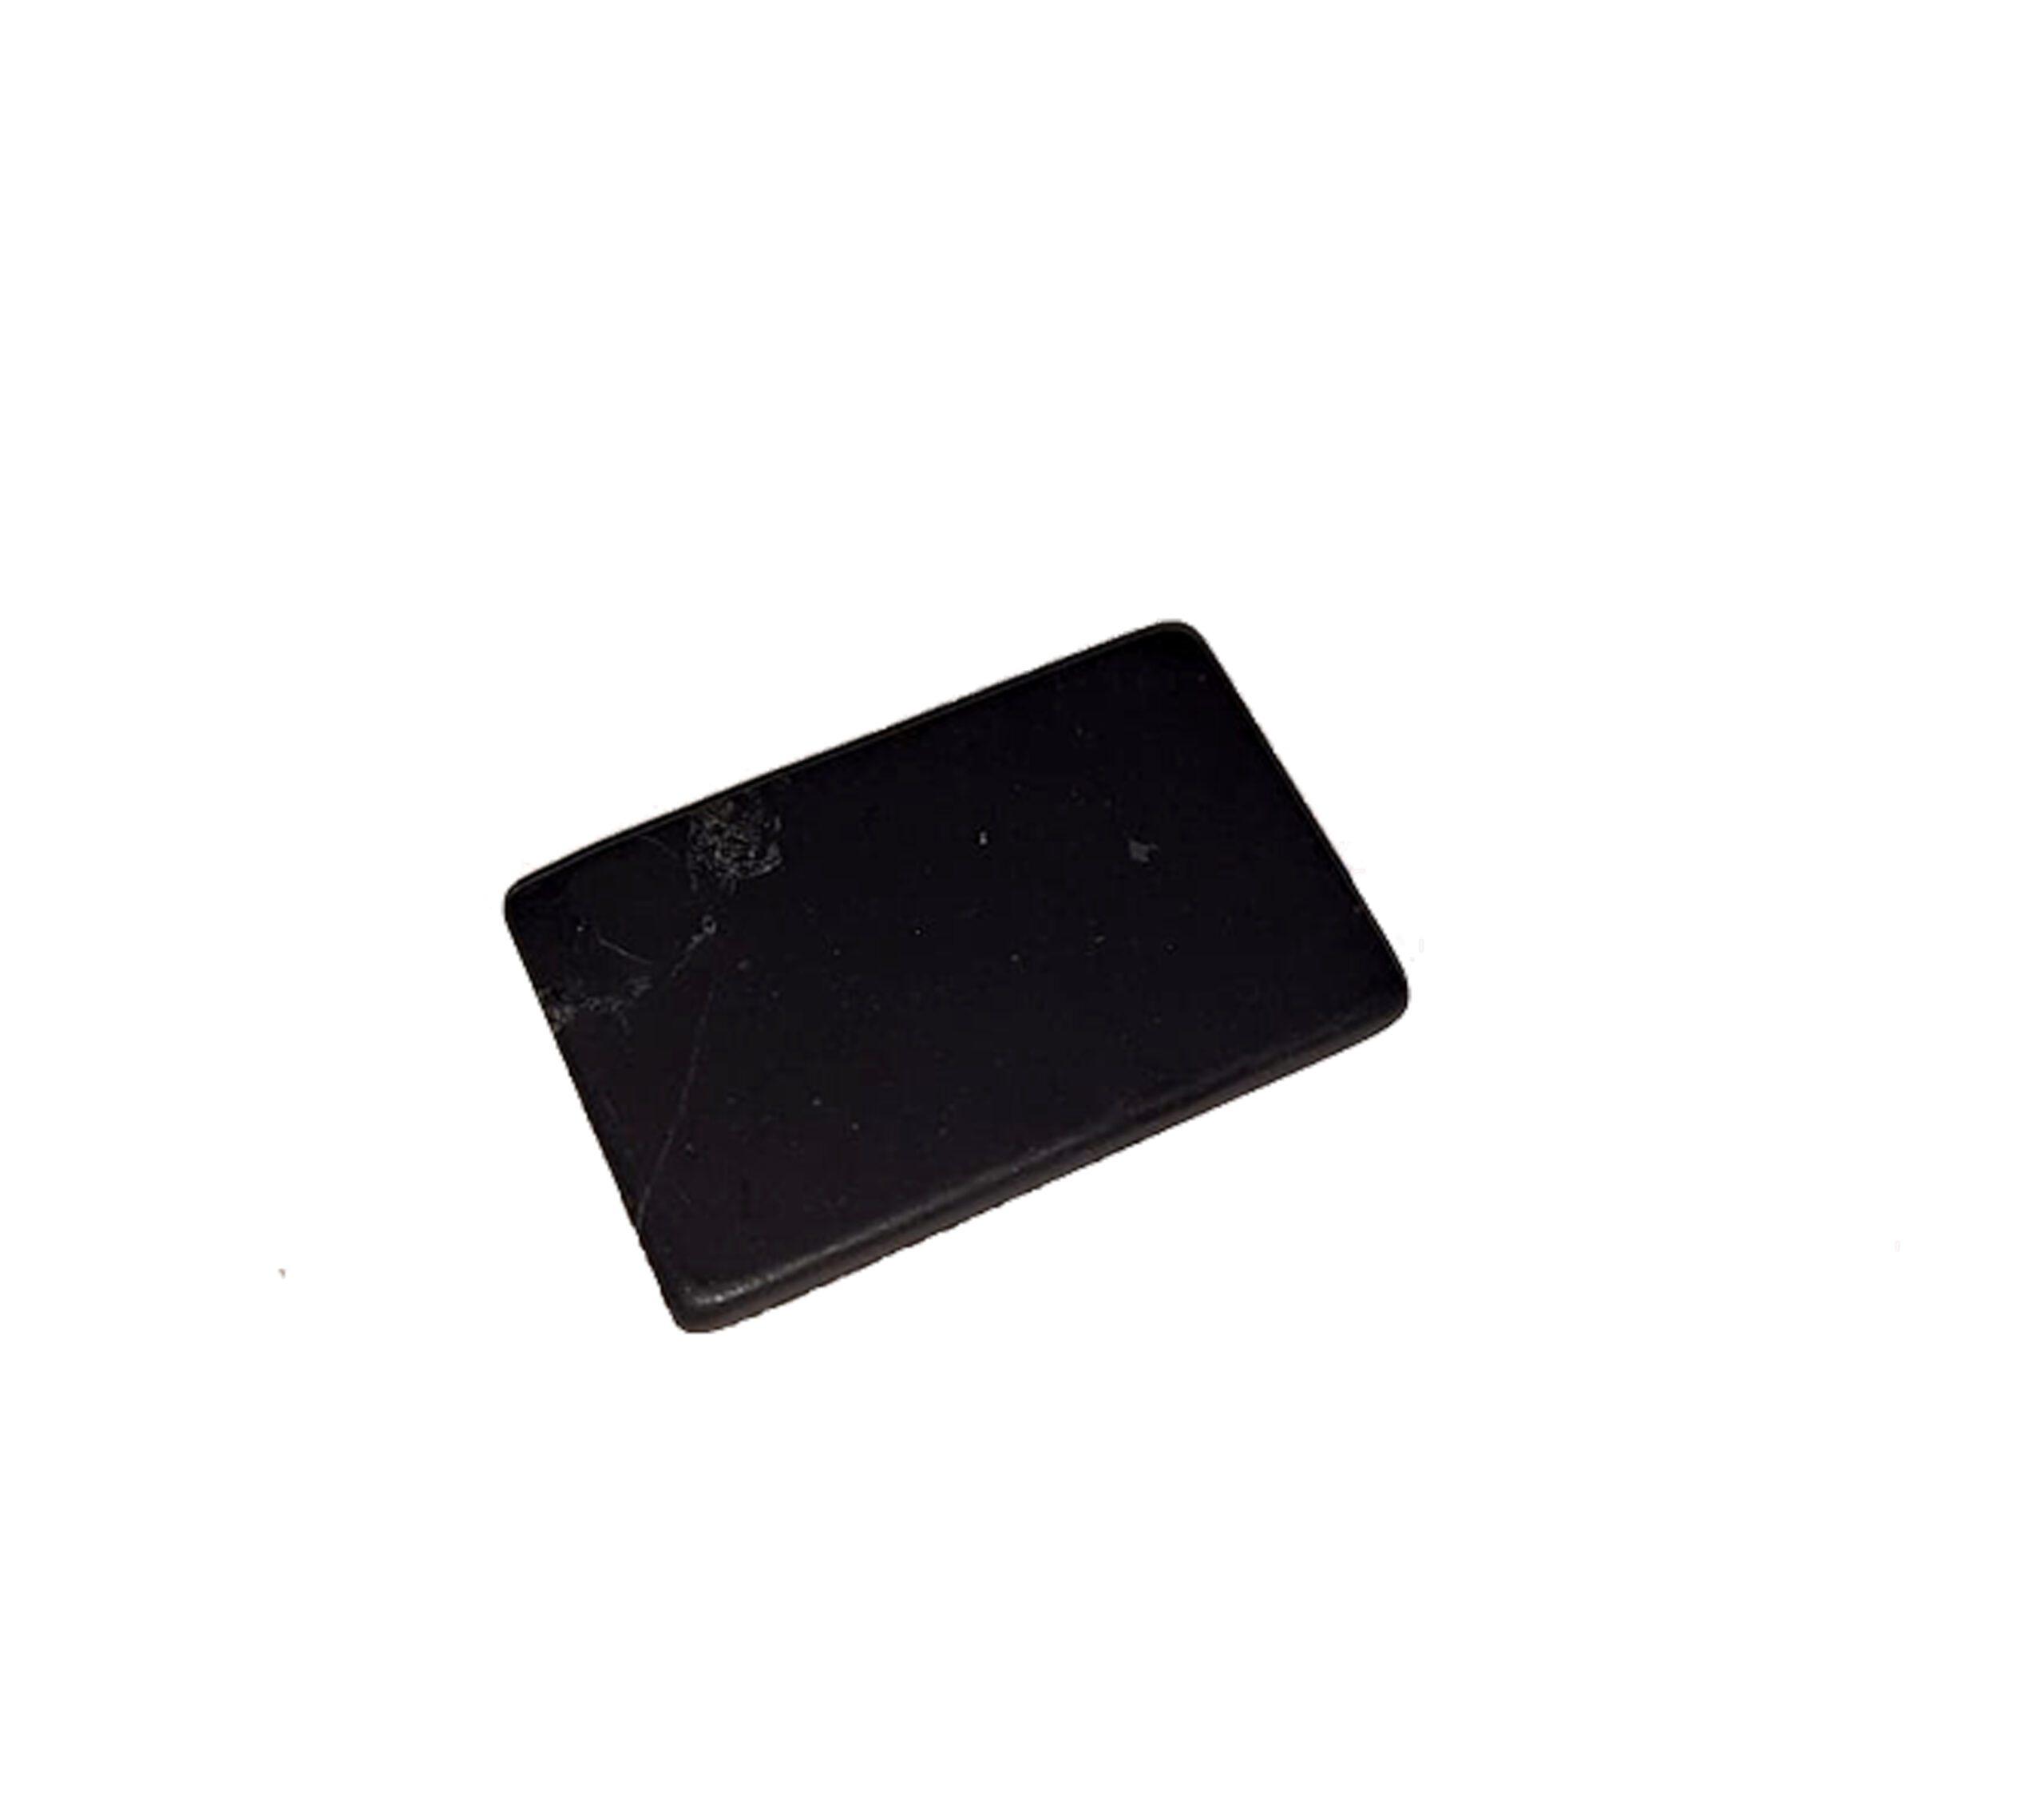 Anti-straling Ipad of Tablet 30 mm x 20 mm